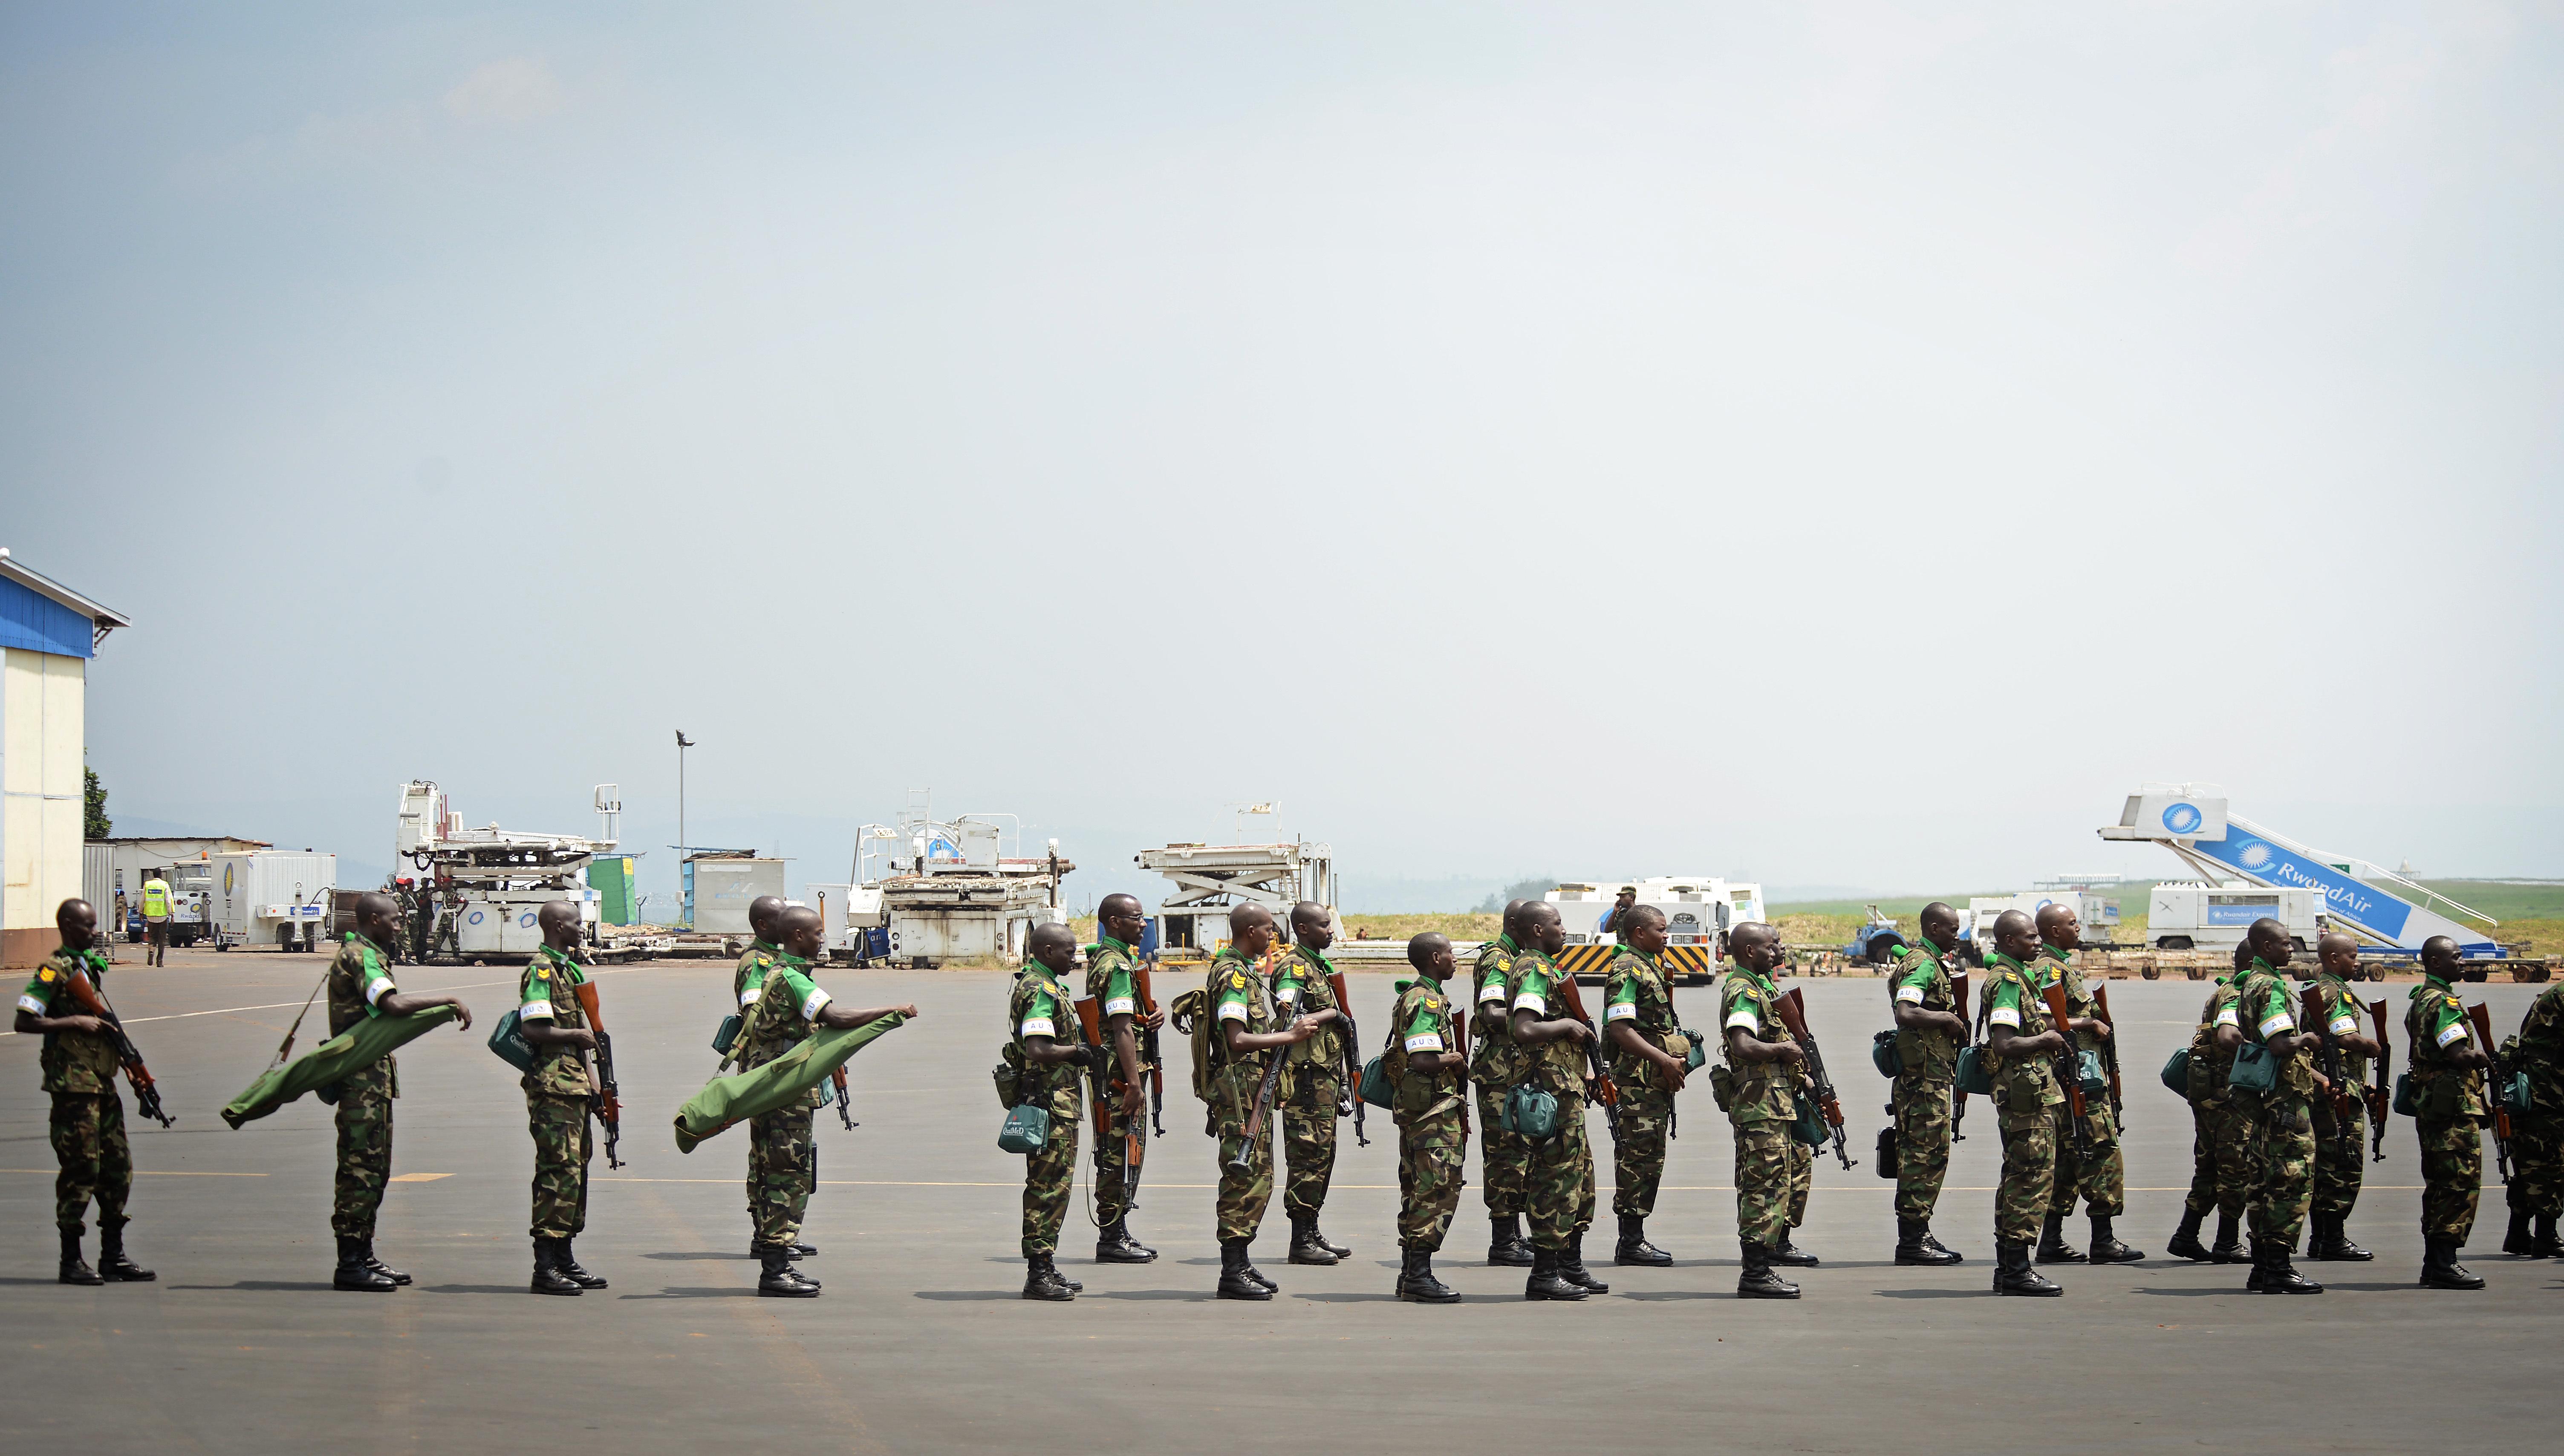 File:Rwandan soldiers wait in line to board a U.S. Air Force C-17